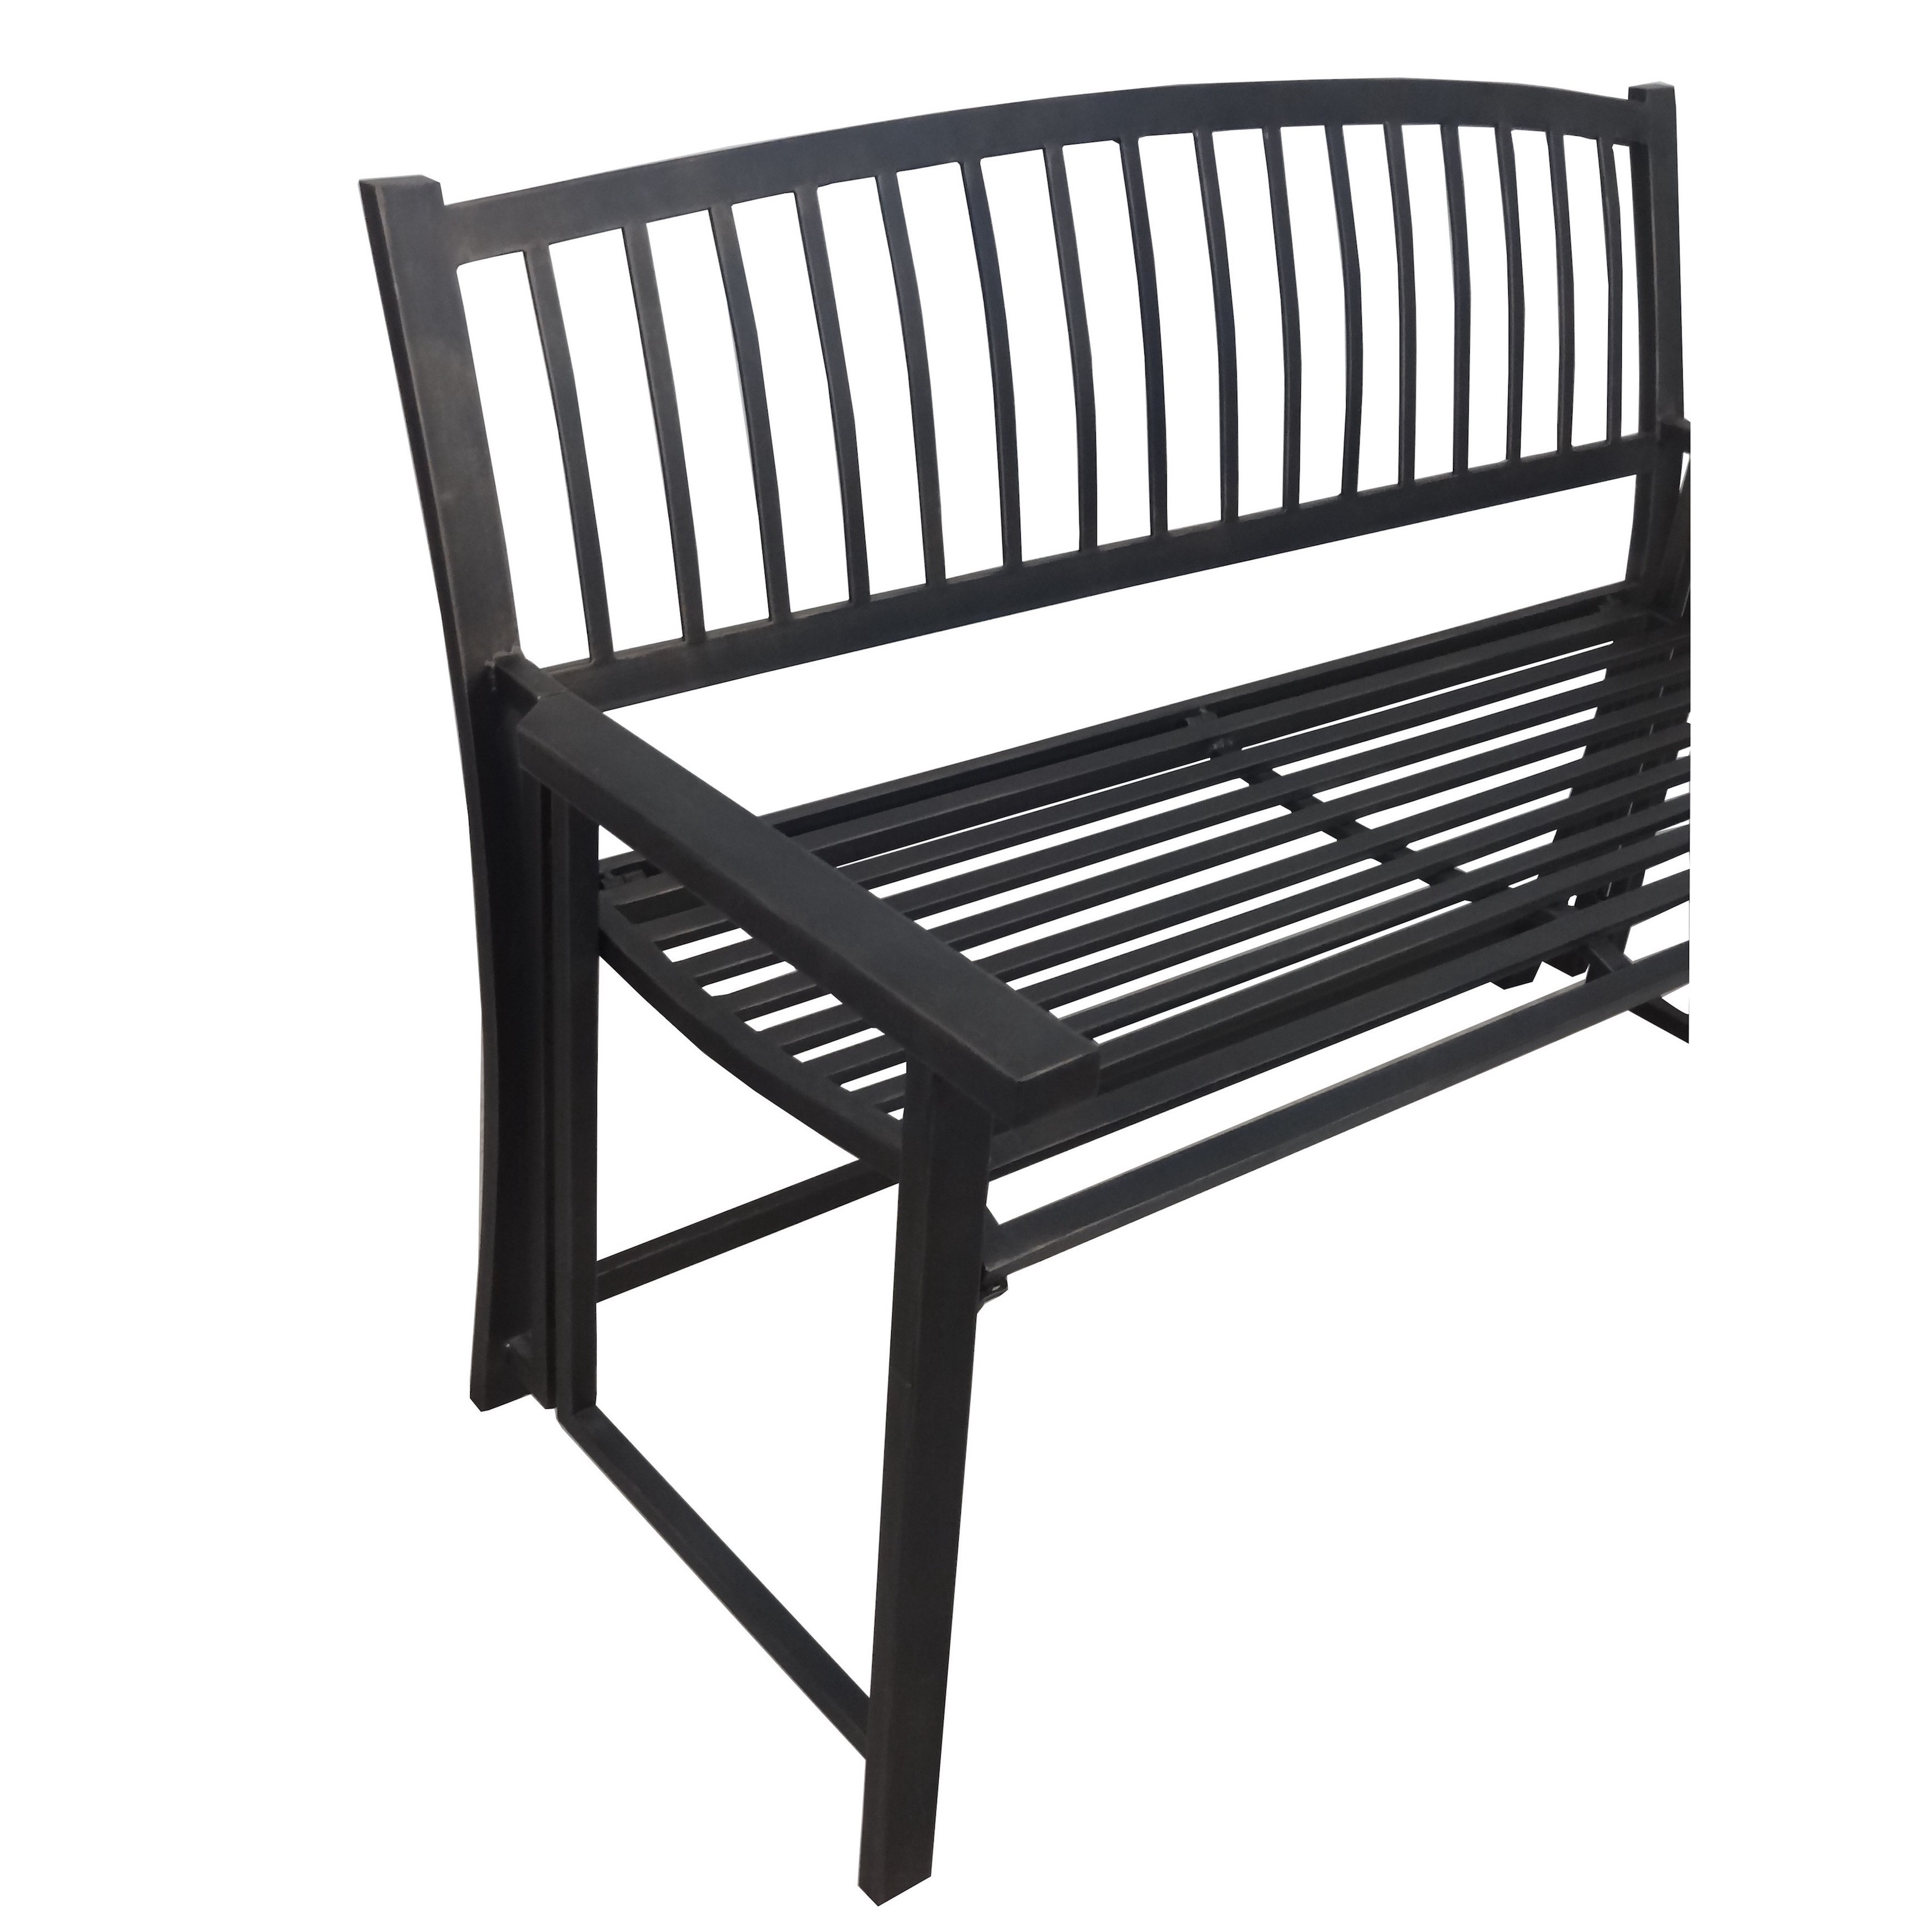 Crawford U0026 Burke Nolin Black Metal Folding Outdoor Patio Bench   Free  Shipping Today   Overstock   20006454